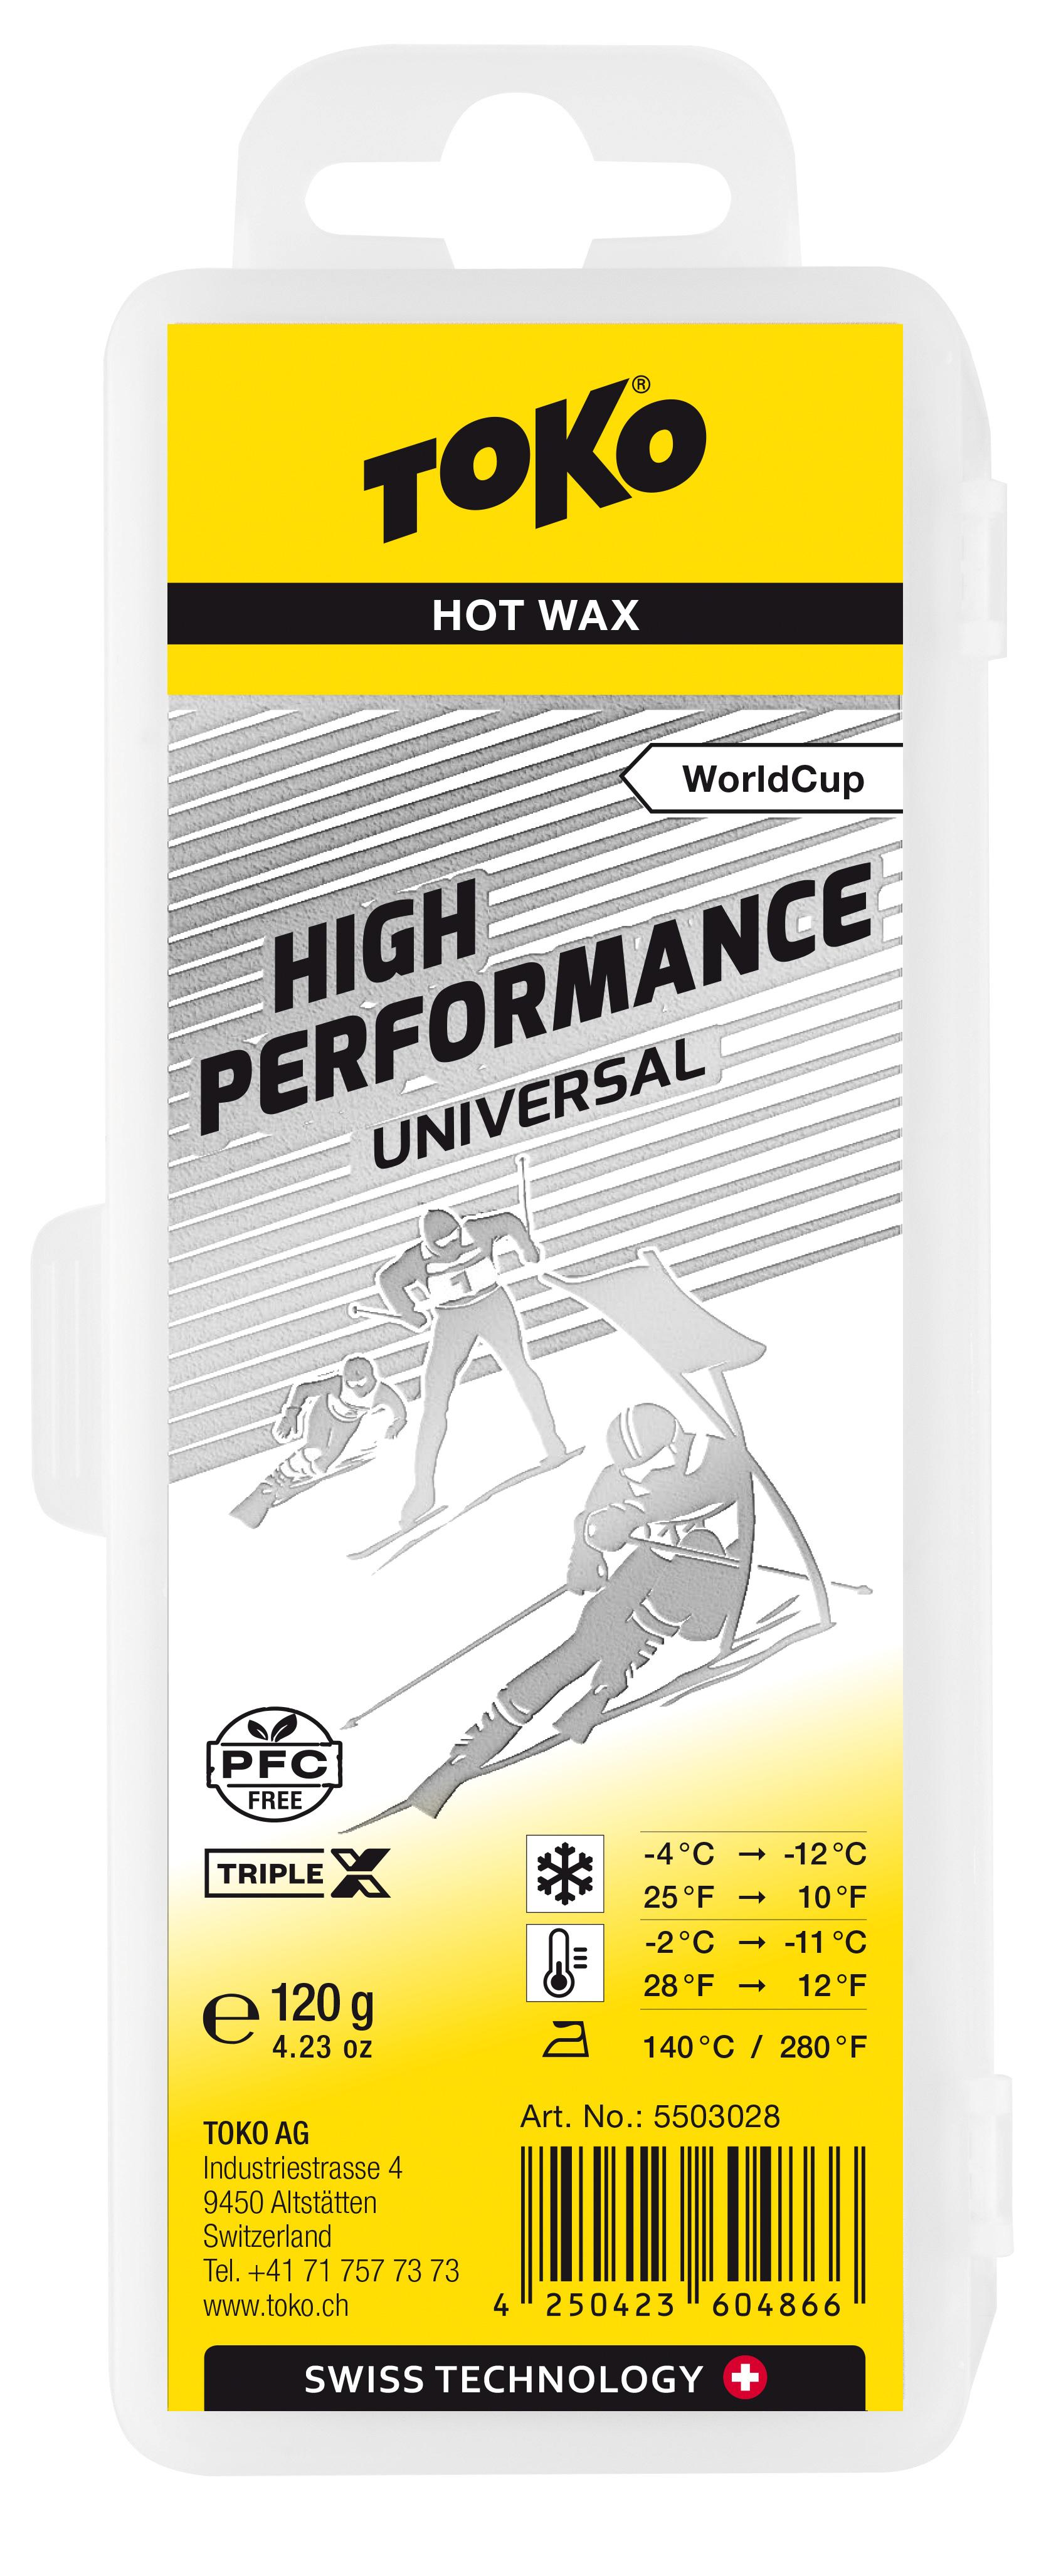 TOKO WC High Performance Universal 120g